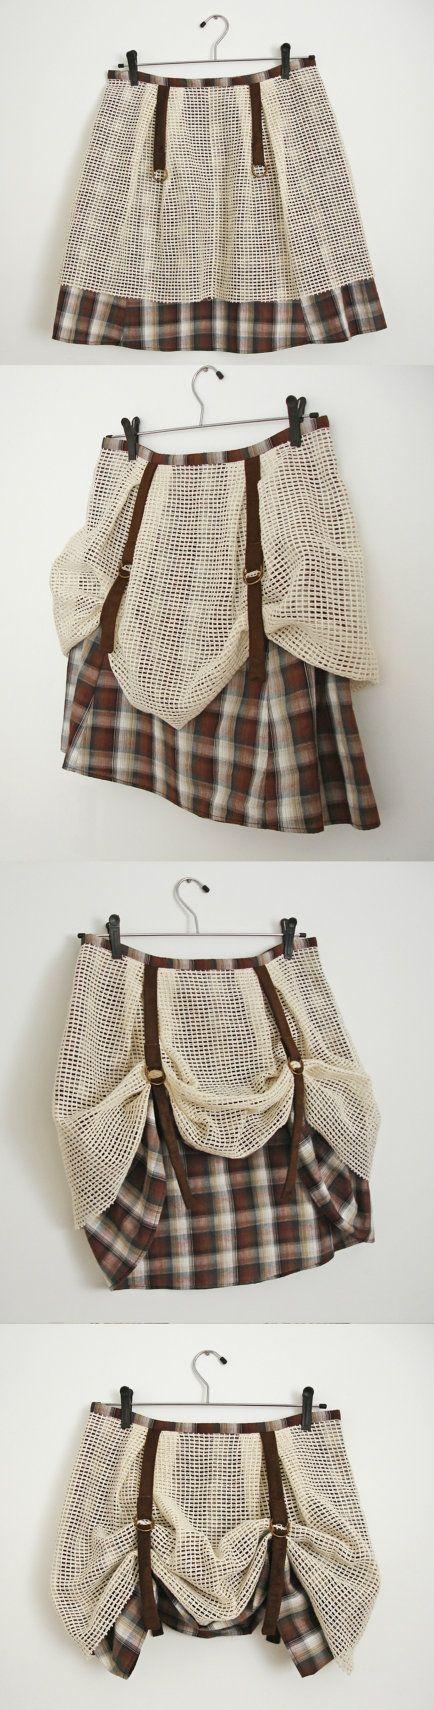 adorable skirt!                                             #etsy  #fashion  #steampunk